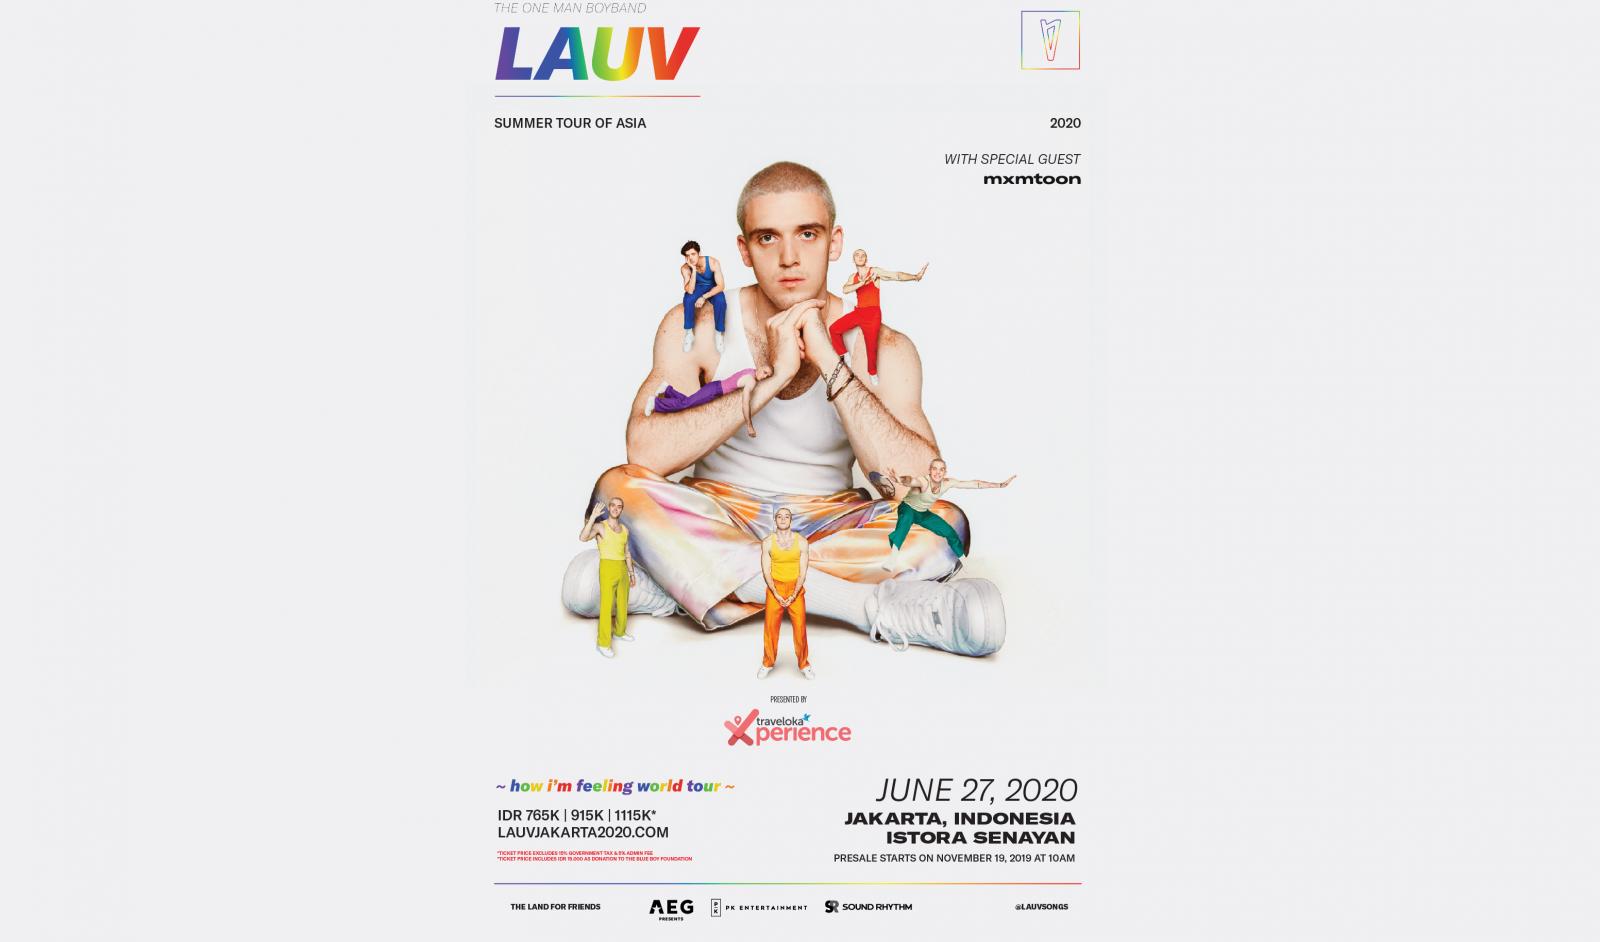 Lauv bakal gelar konser di Jakarta Juni 2020 (Foto: AEG Presents Asia)